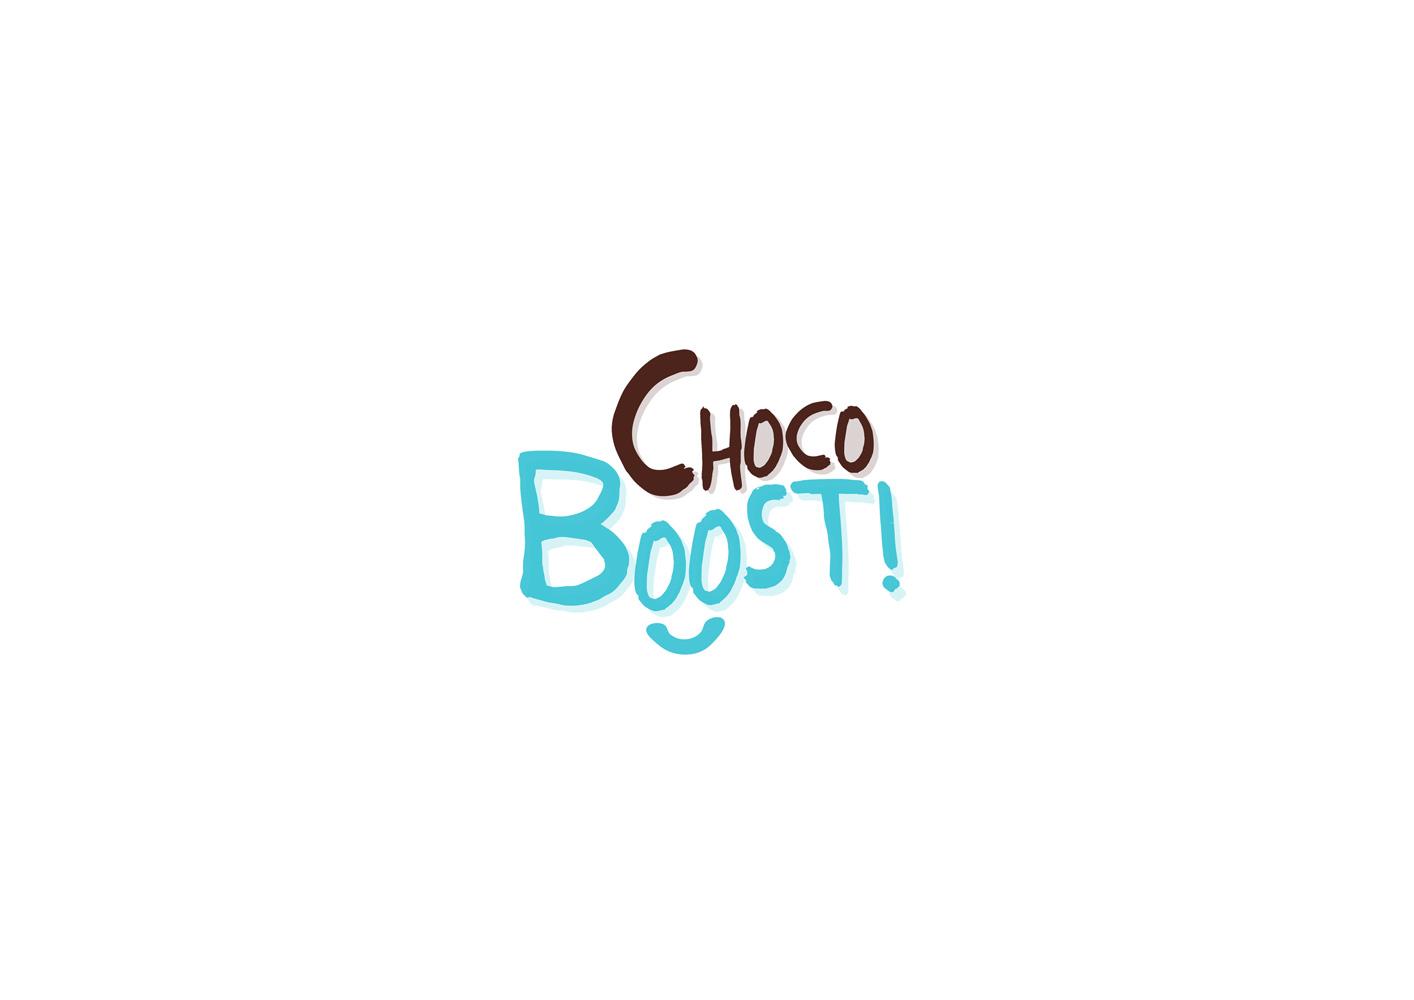 Chocoboost